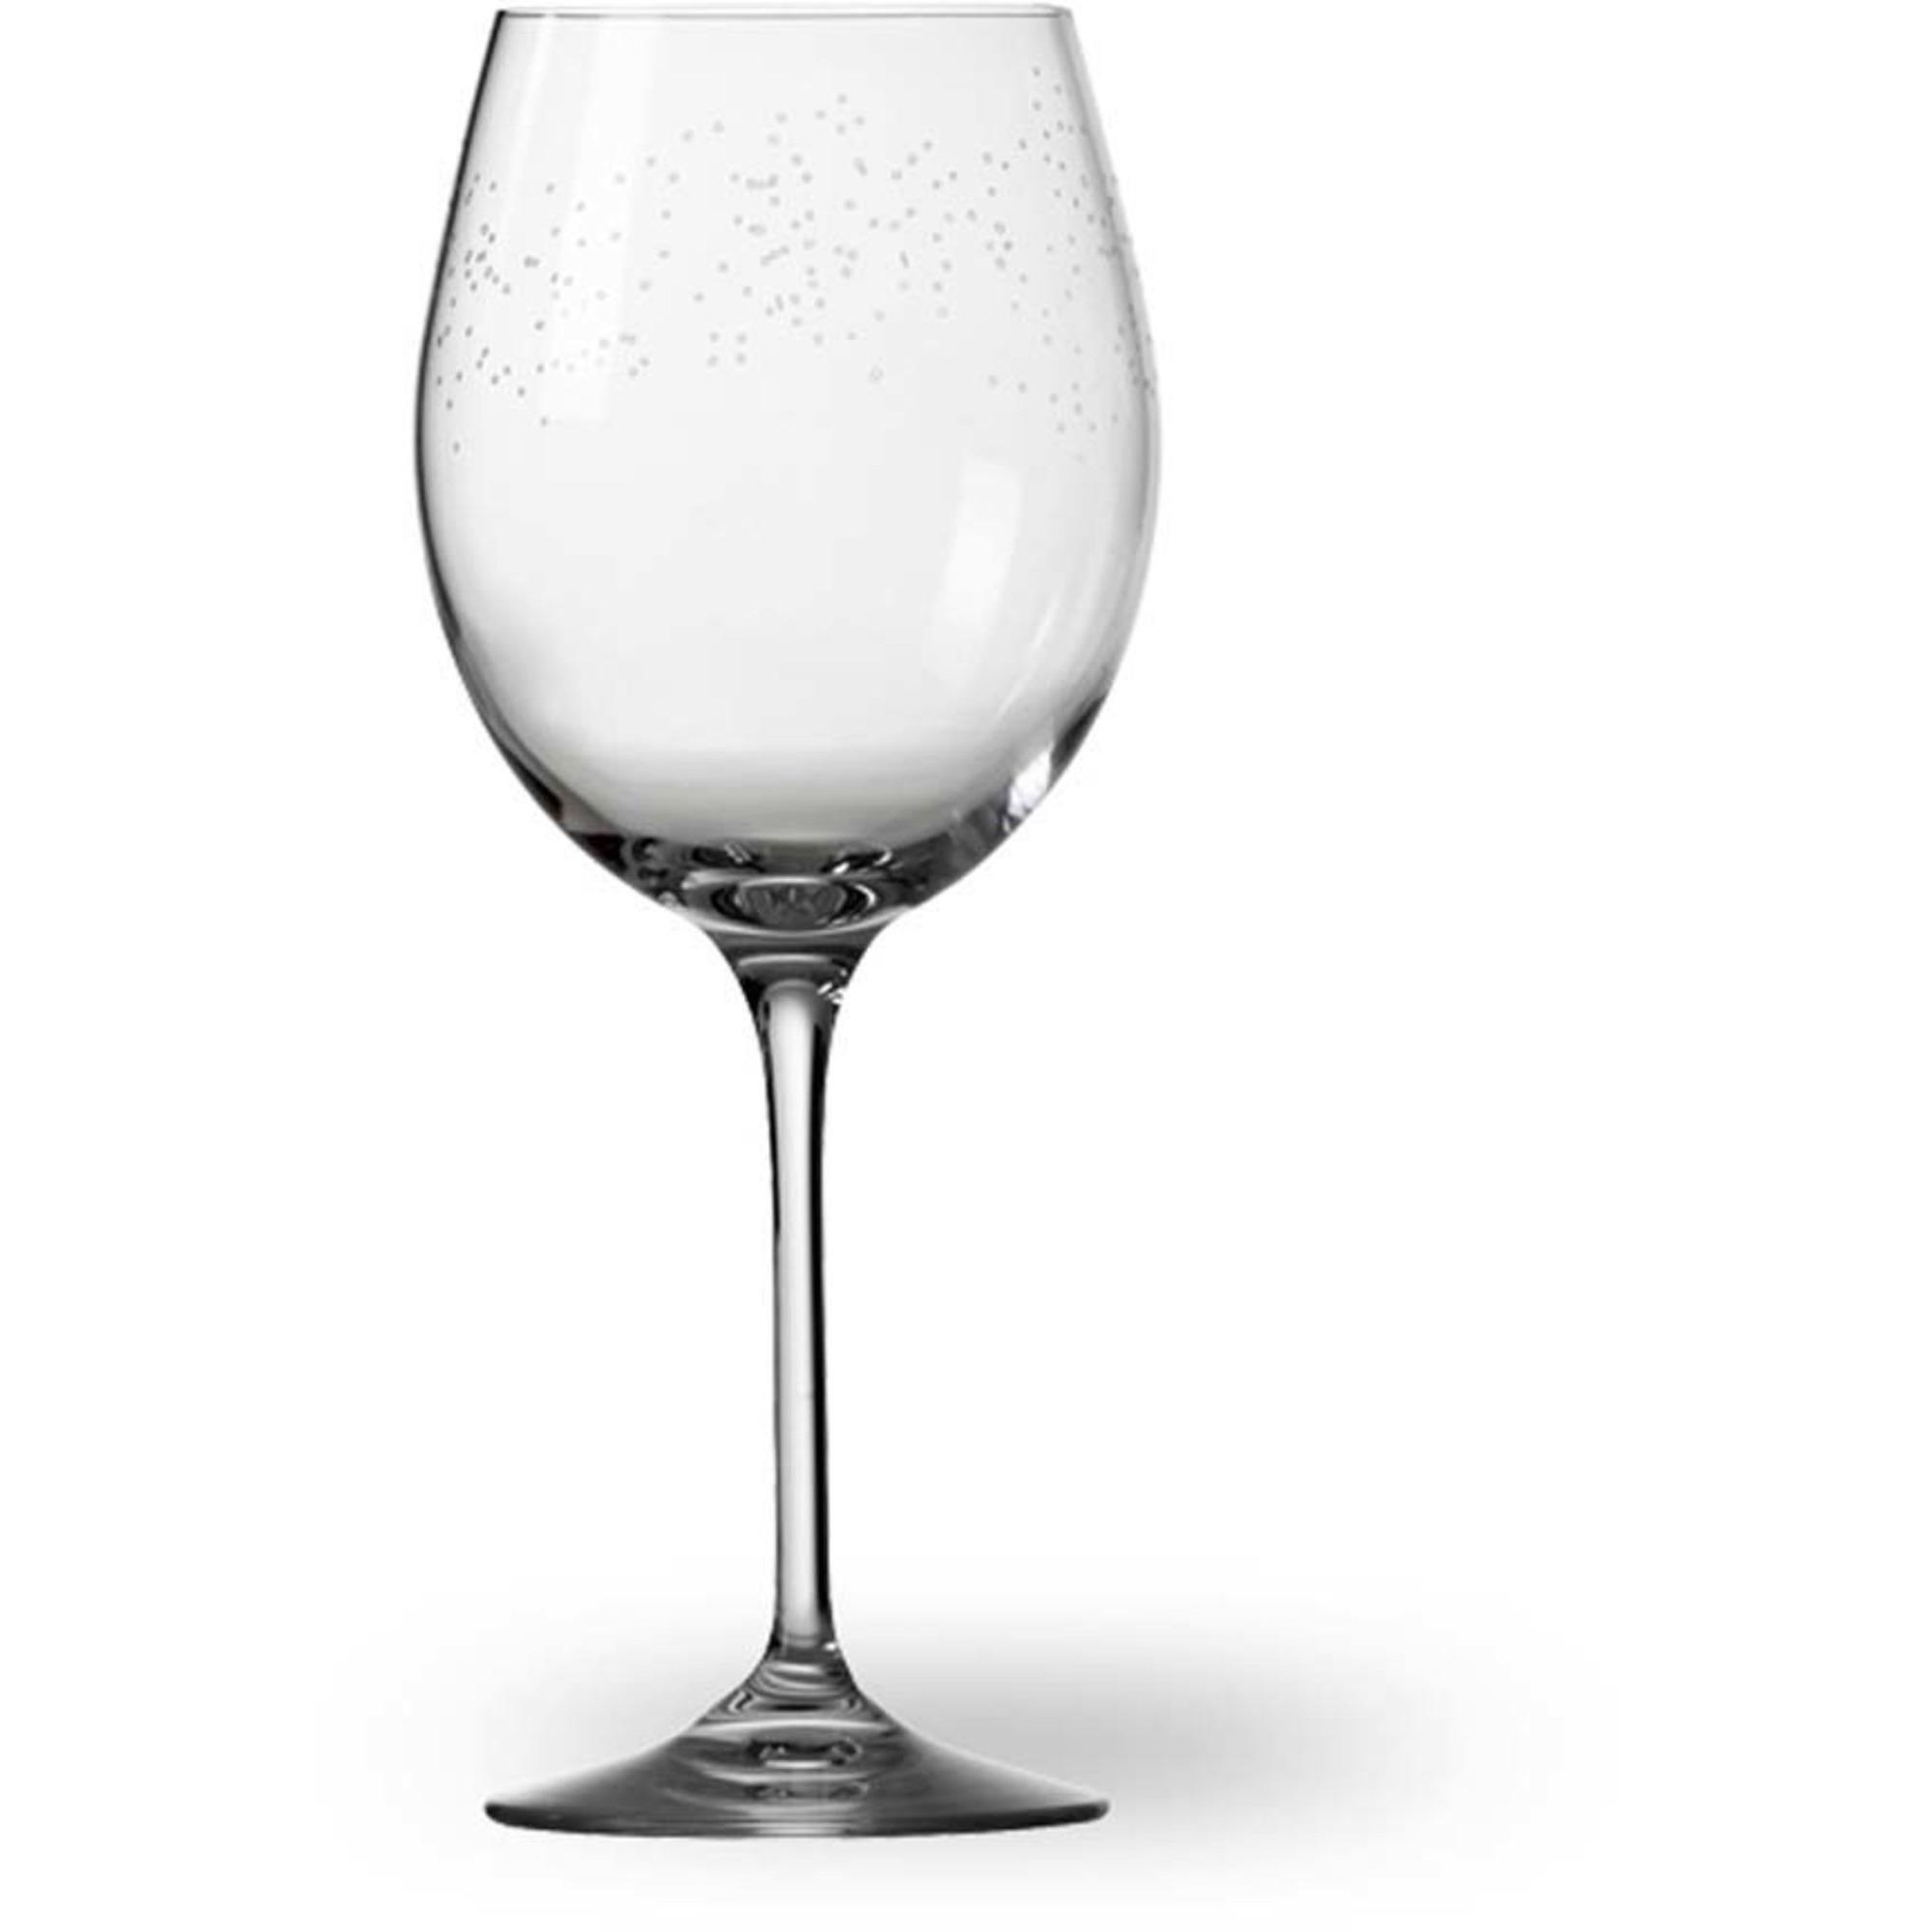 Wik & Walsøe Dugg Rödvinsglas 65 cl